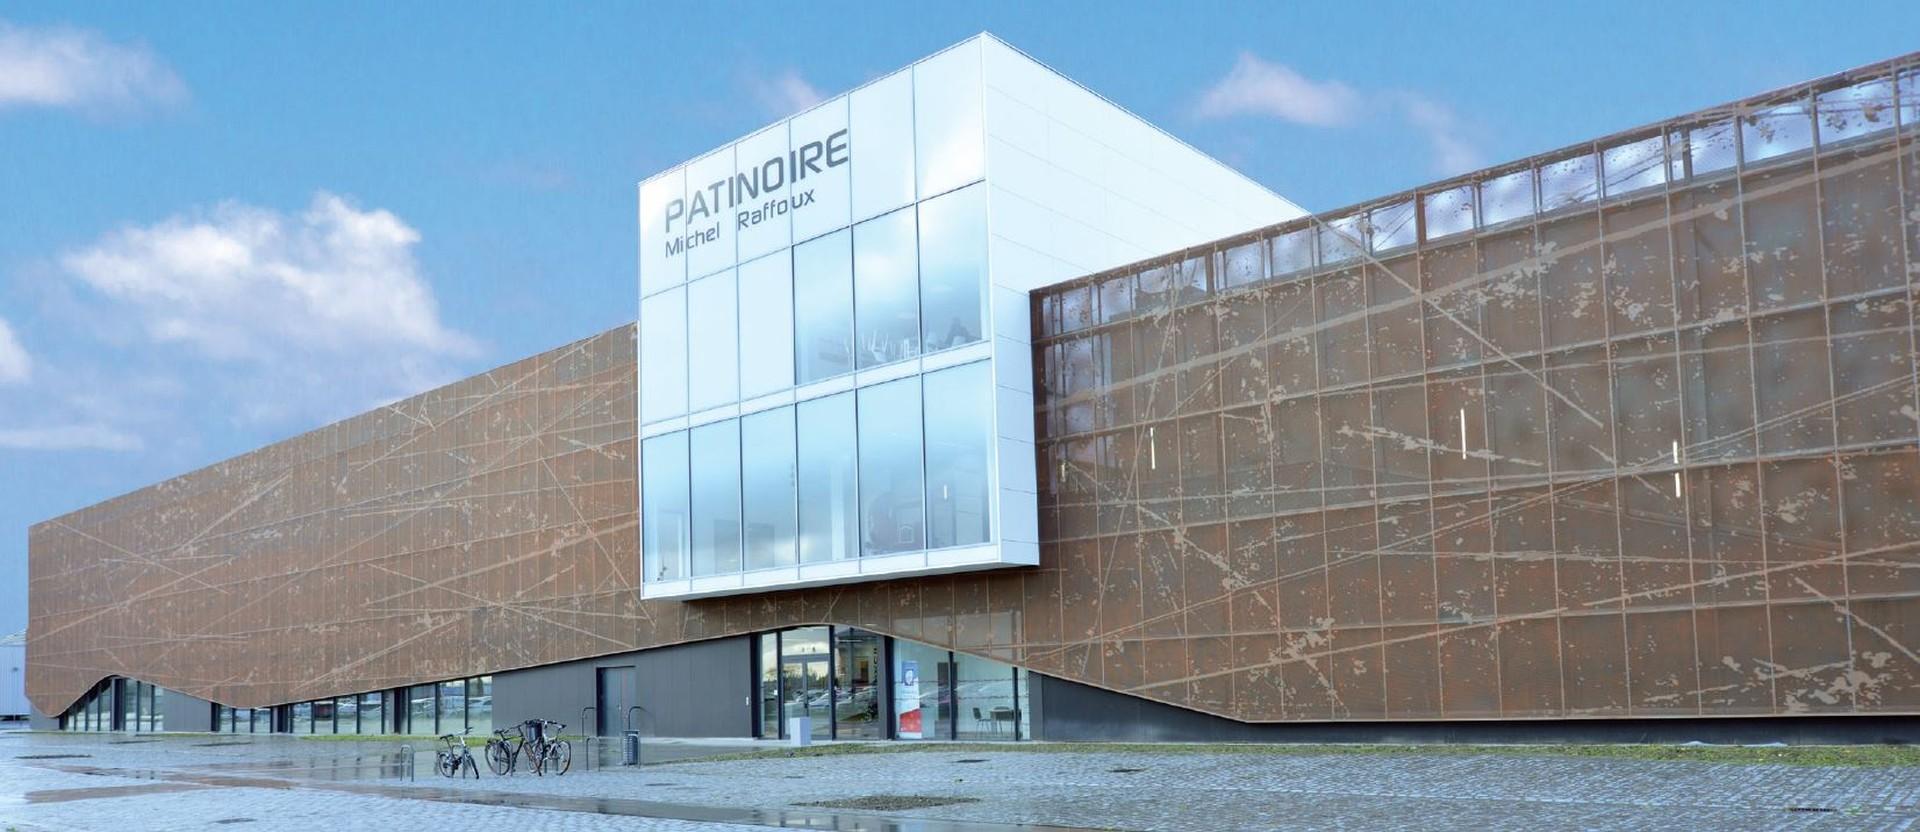 DOORTAL - Patinoire olympique façade